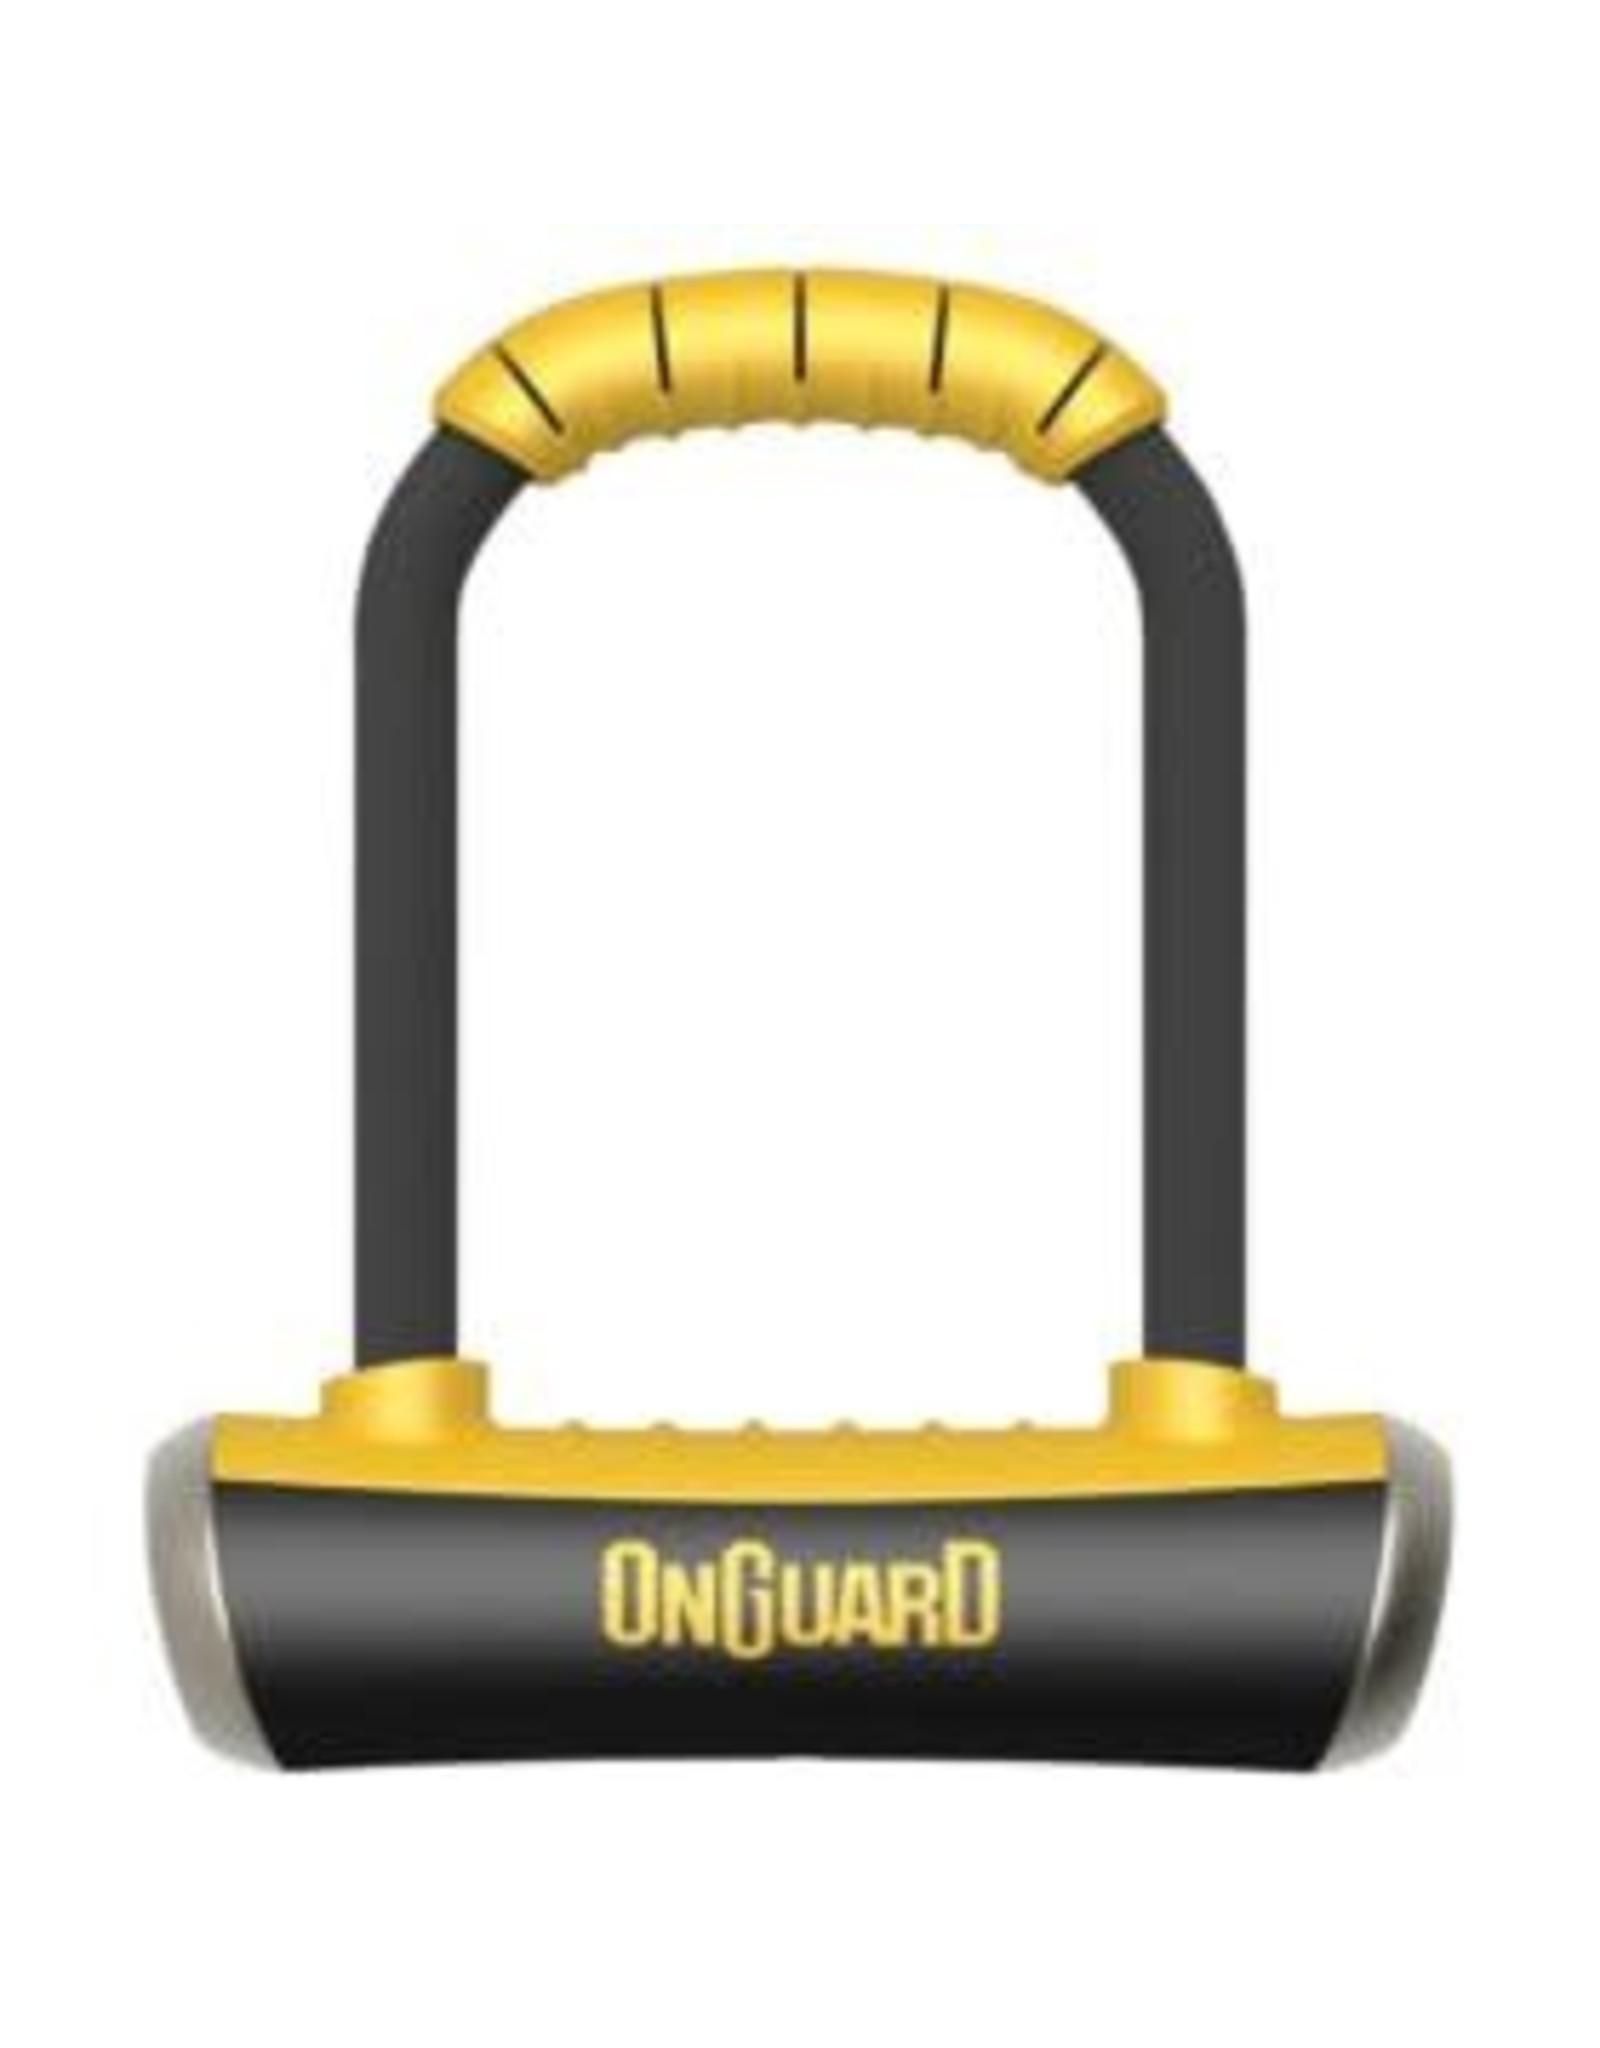 Onguard PITBULL MEDIUM 8006M